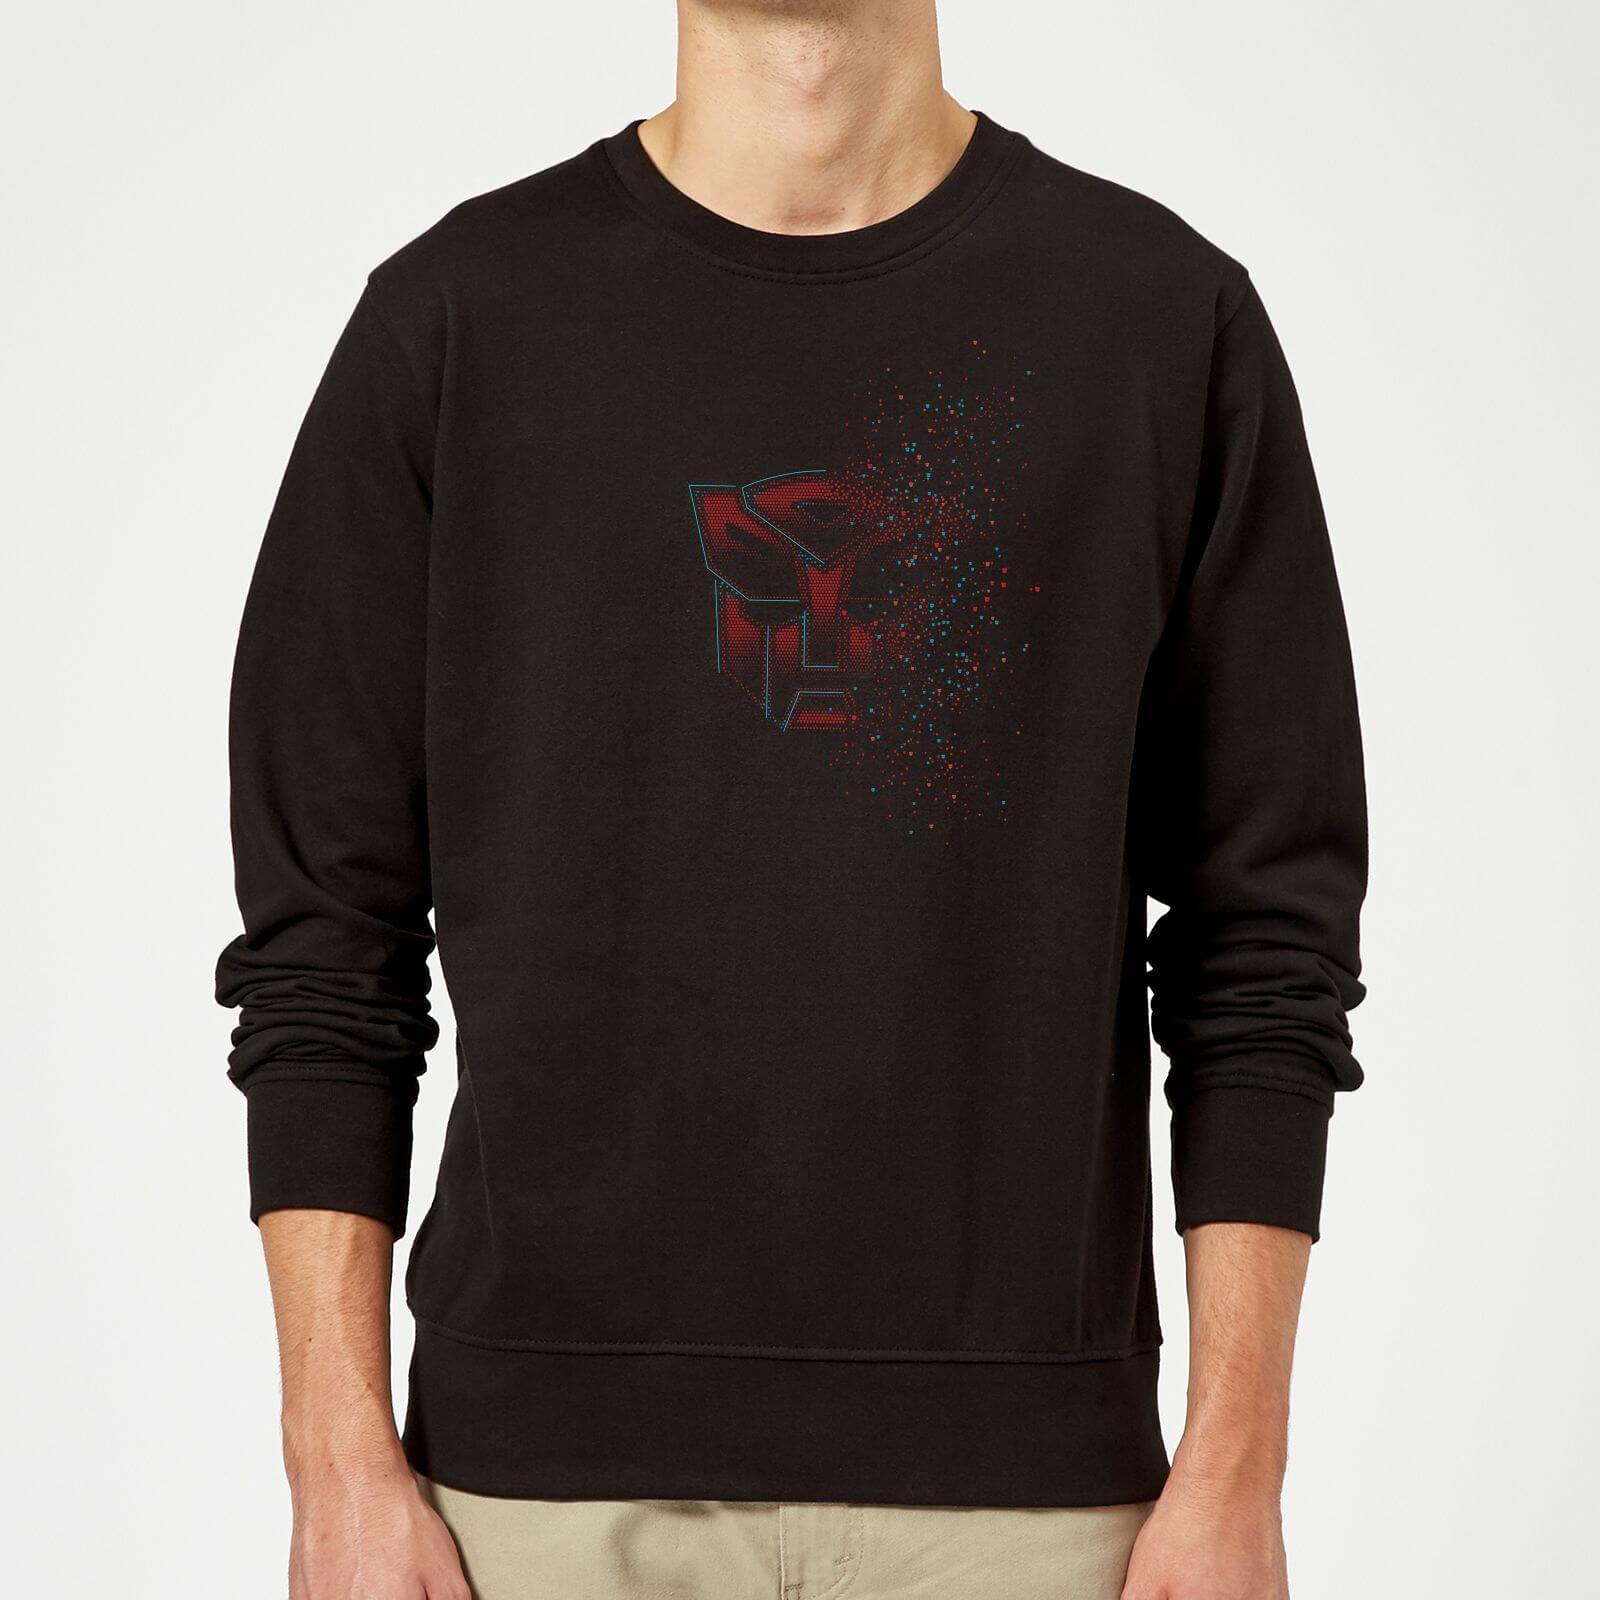 Transformers Autobot Fade Sweatshirt   Black   5XL   Black